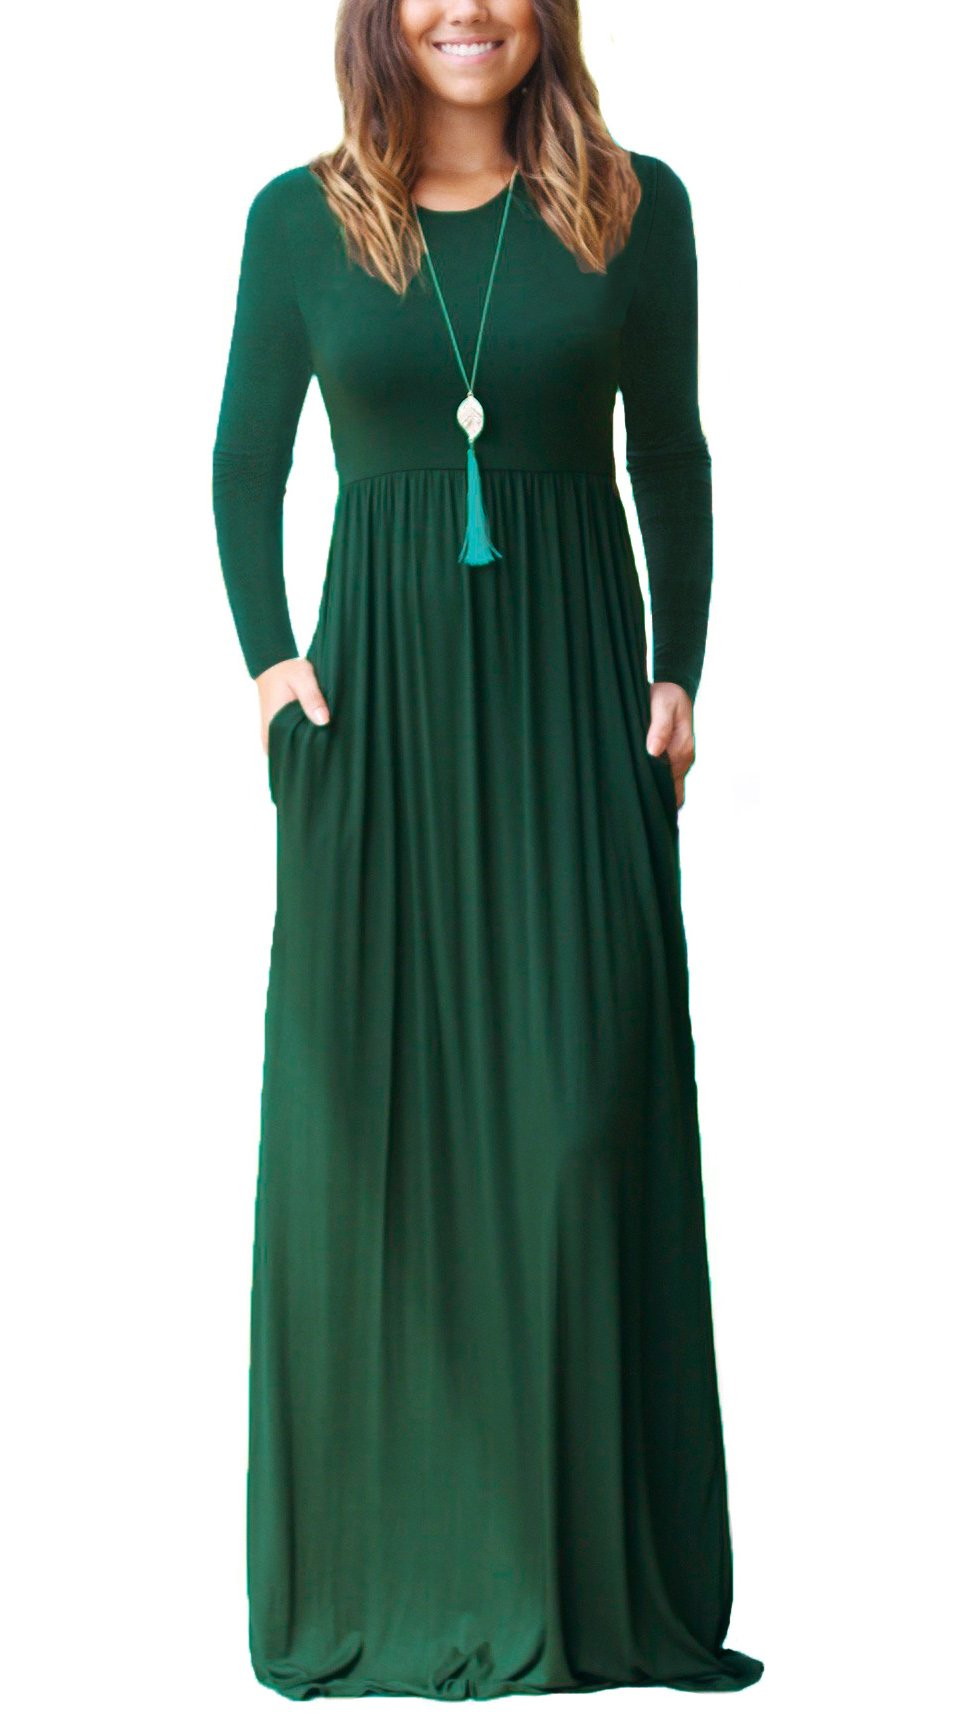 2c1c056aea3 DEARCASE Women Long Sleeve Loose Plain Maxi Pockets Dresses Casual Long  Dresses product image